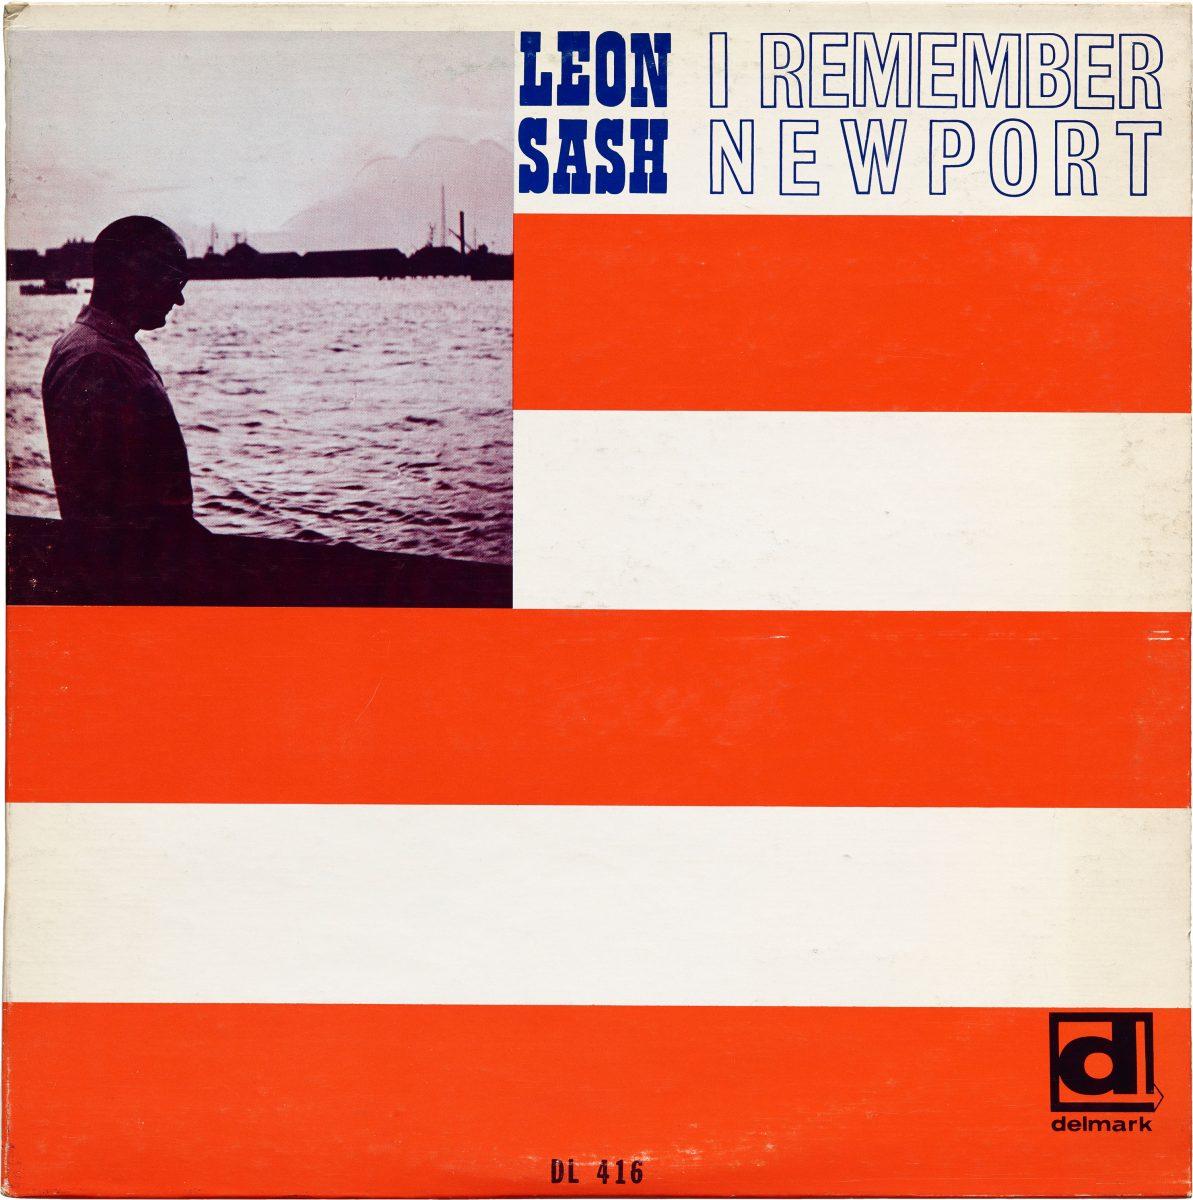 Leon Sash, I Remember Newport, 1968. Design: Sylvia Abernathy. Photo: Lee Morgan. Courtesy Letterform Archive